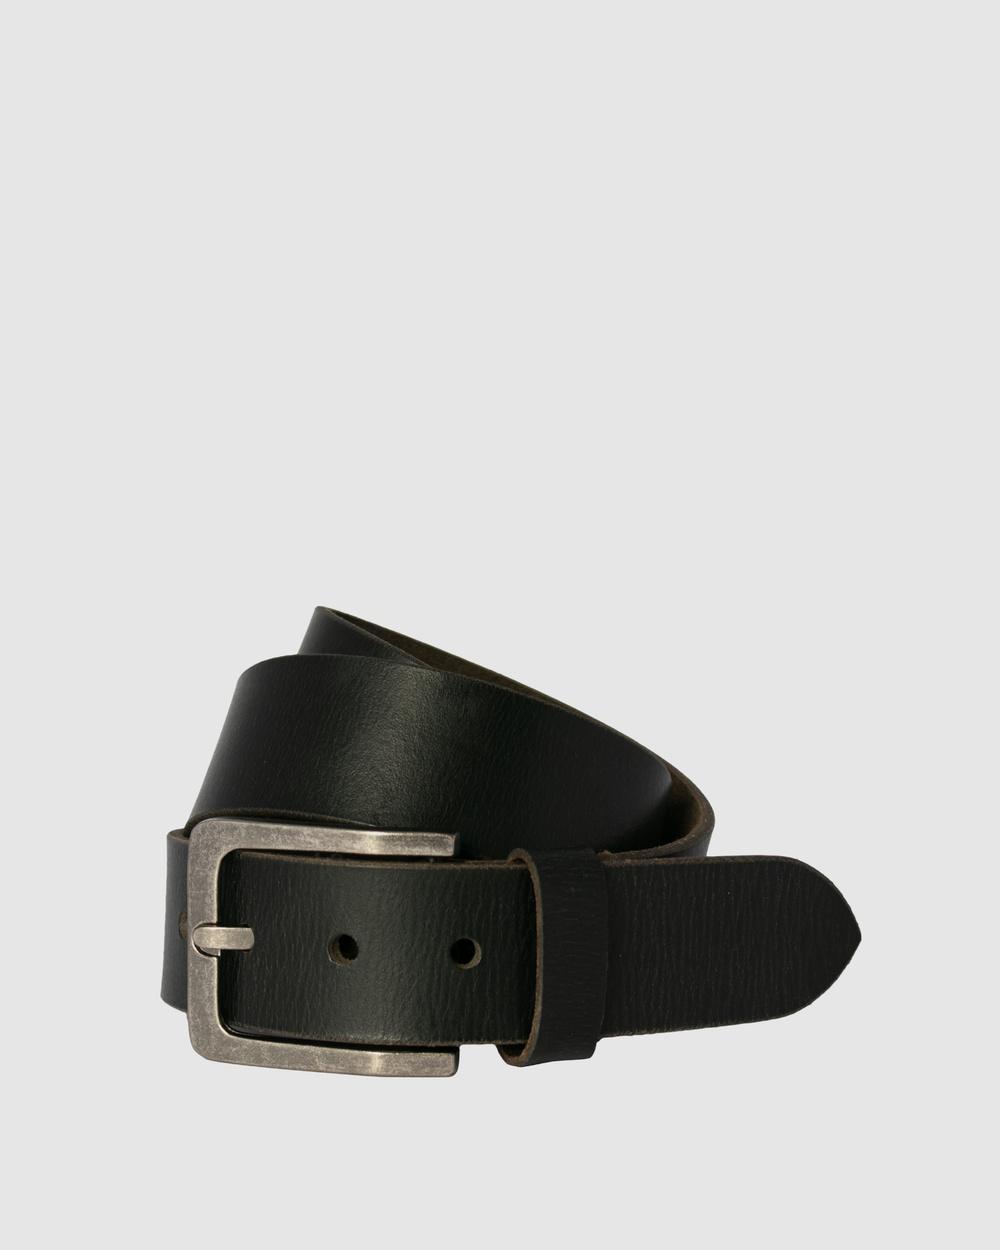 Loop Leather Co Billy Basic Belts Black